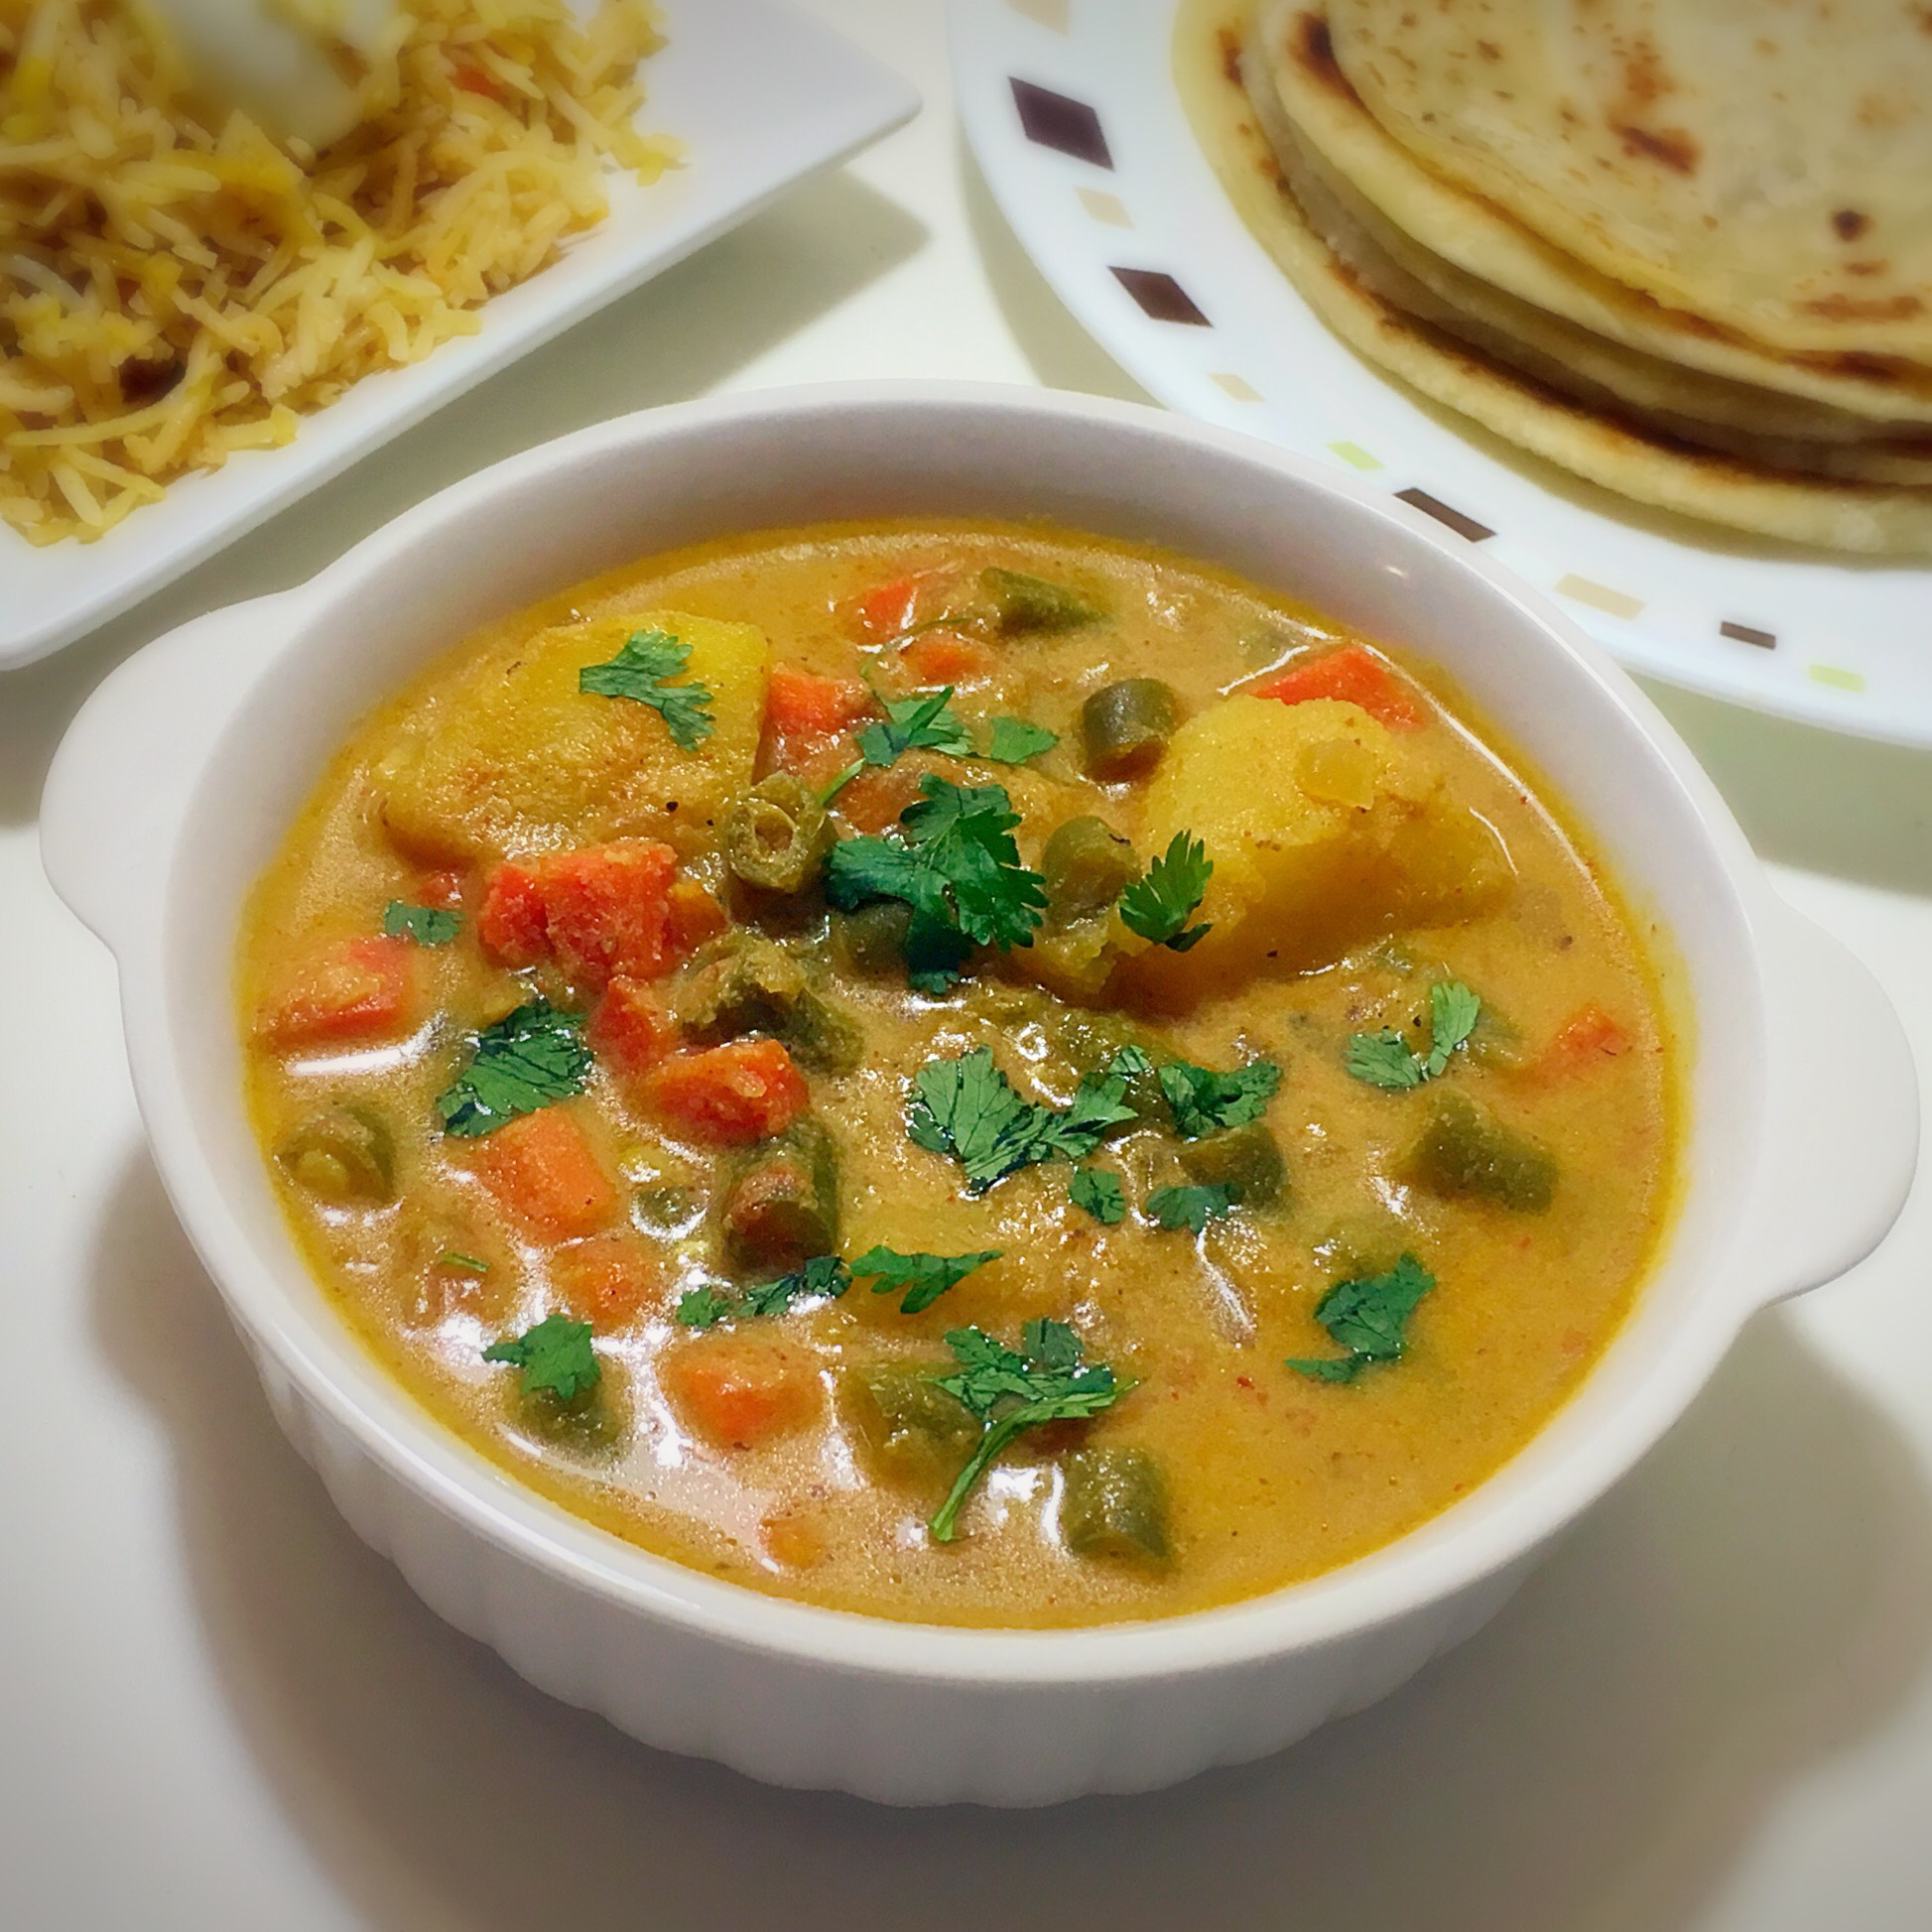 onion,coconut,salna,kurma,vegetable salna,parotta,indian food,kothu parotta,salna recipe,south indian food,food,kurma recipe,vegetable kurma,how to cook salna,parotta side dish,side dish for parotta,